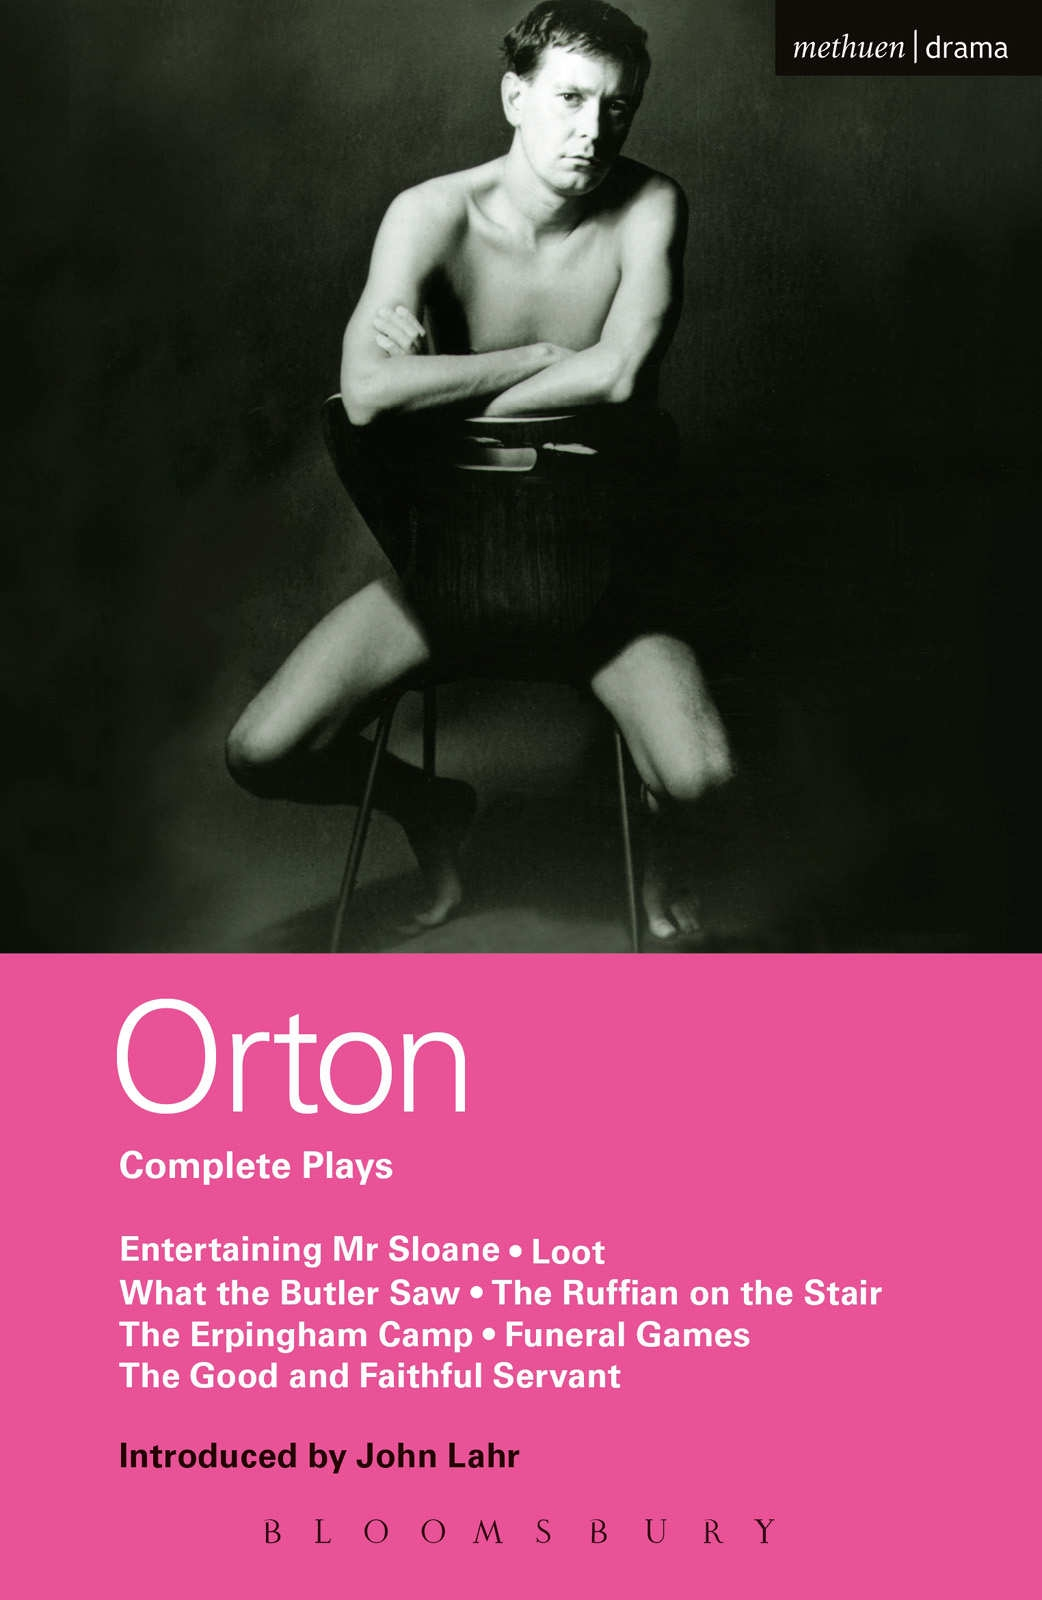 Buy Orton: Complete Plays